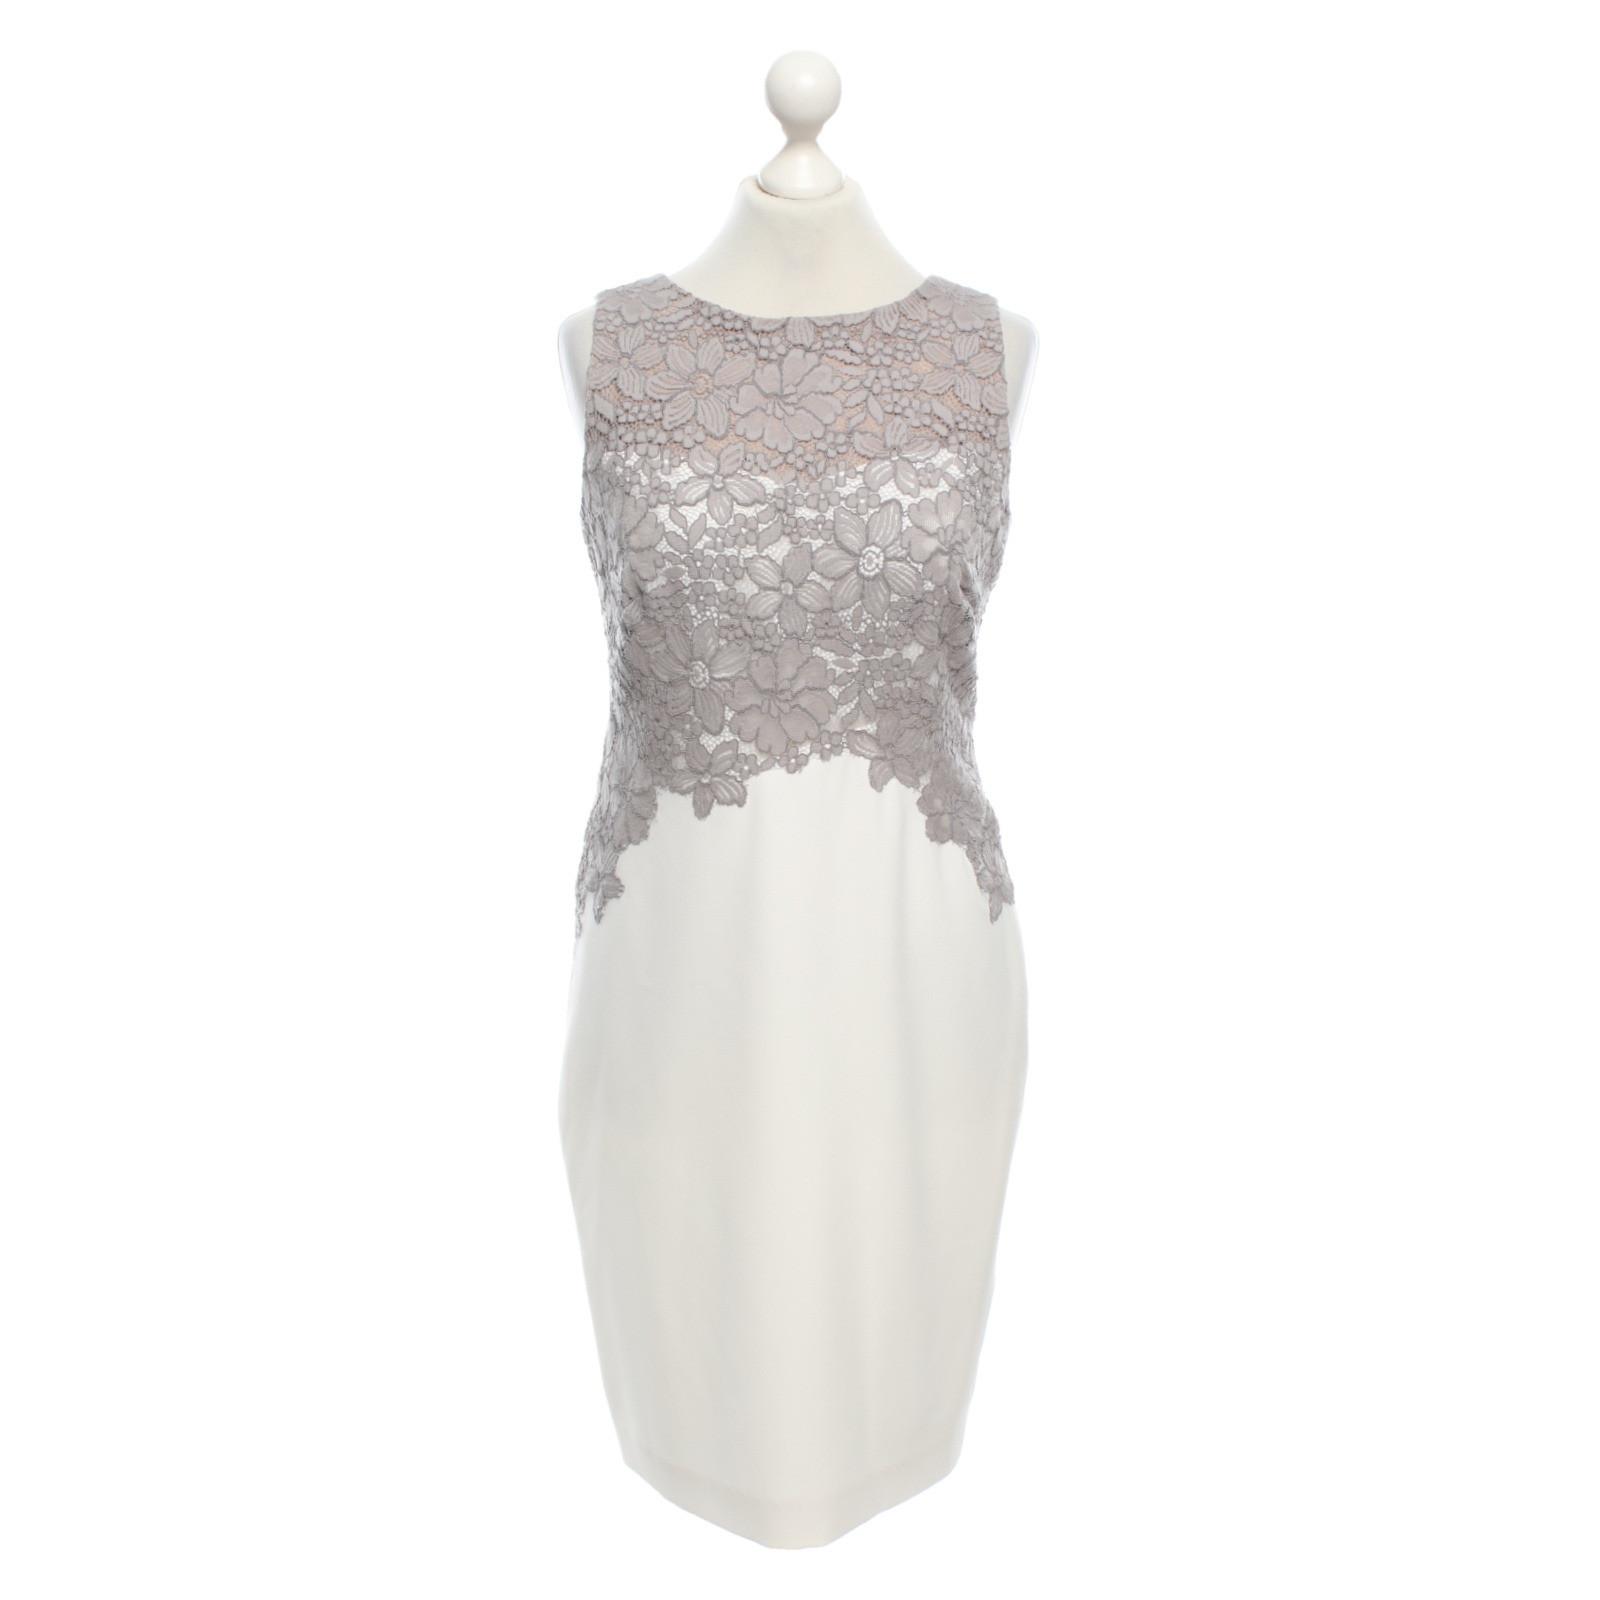 Ralph Lauren Kleid - Second Hand Ralph Lauren Kleid gebraucht